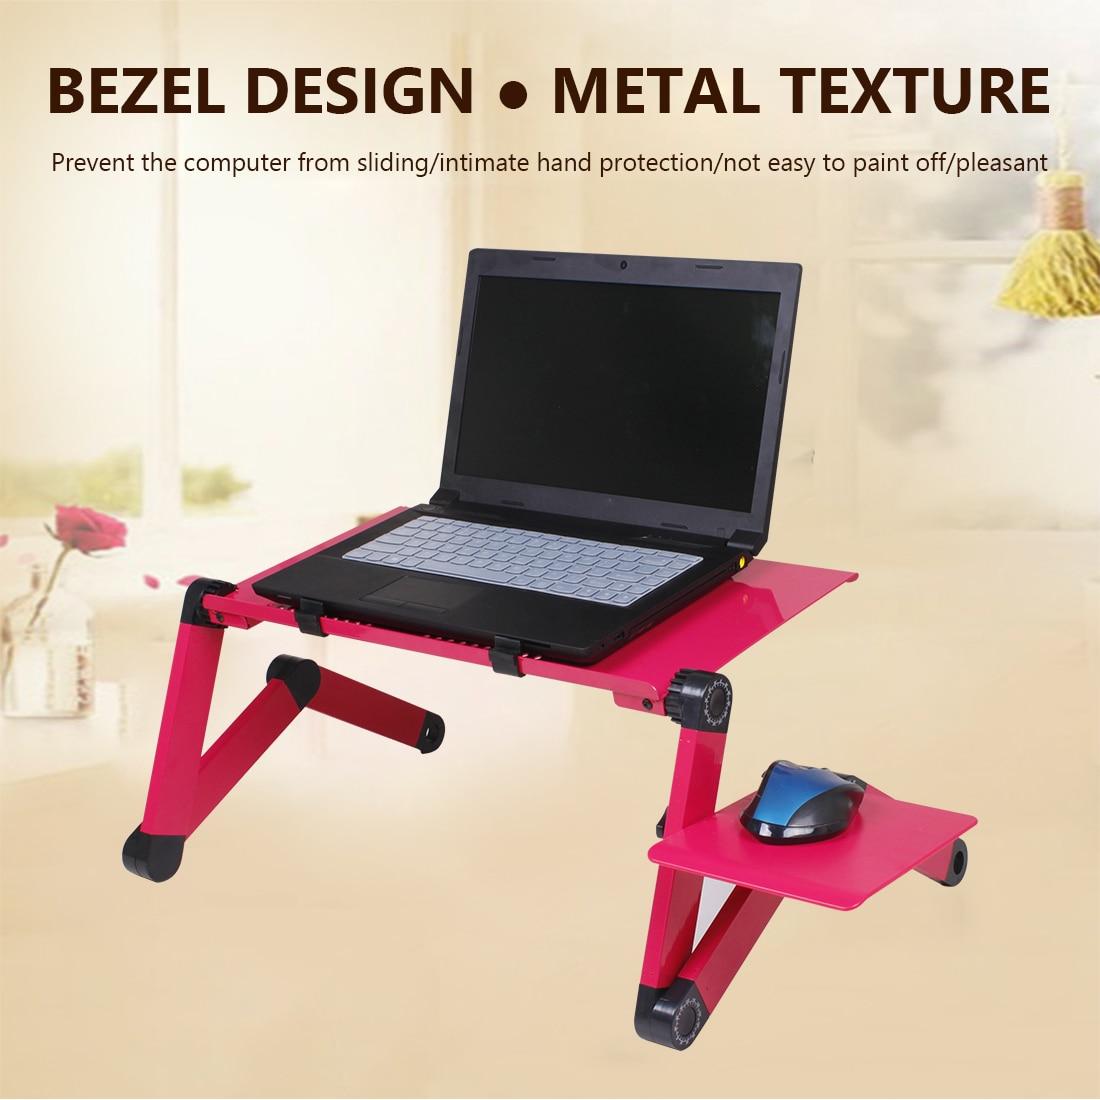 Folding Laptop Desk Adjustable Laptop Table Ergonomic Laptop Desk Tray Portable Notebook Table Desk PC Stand For Sofa Bed